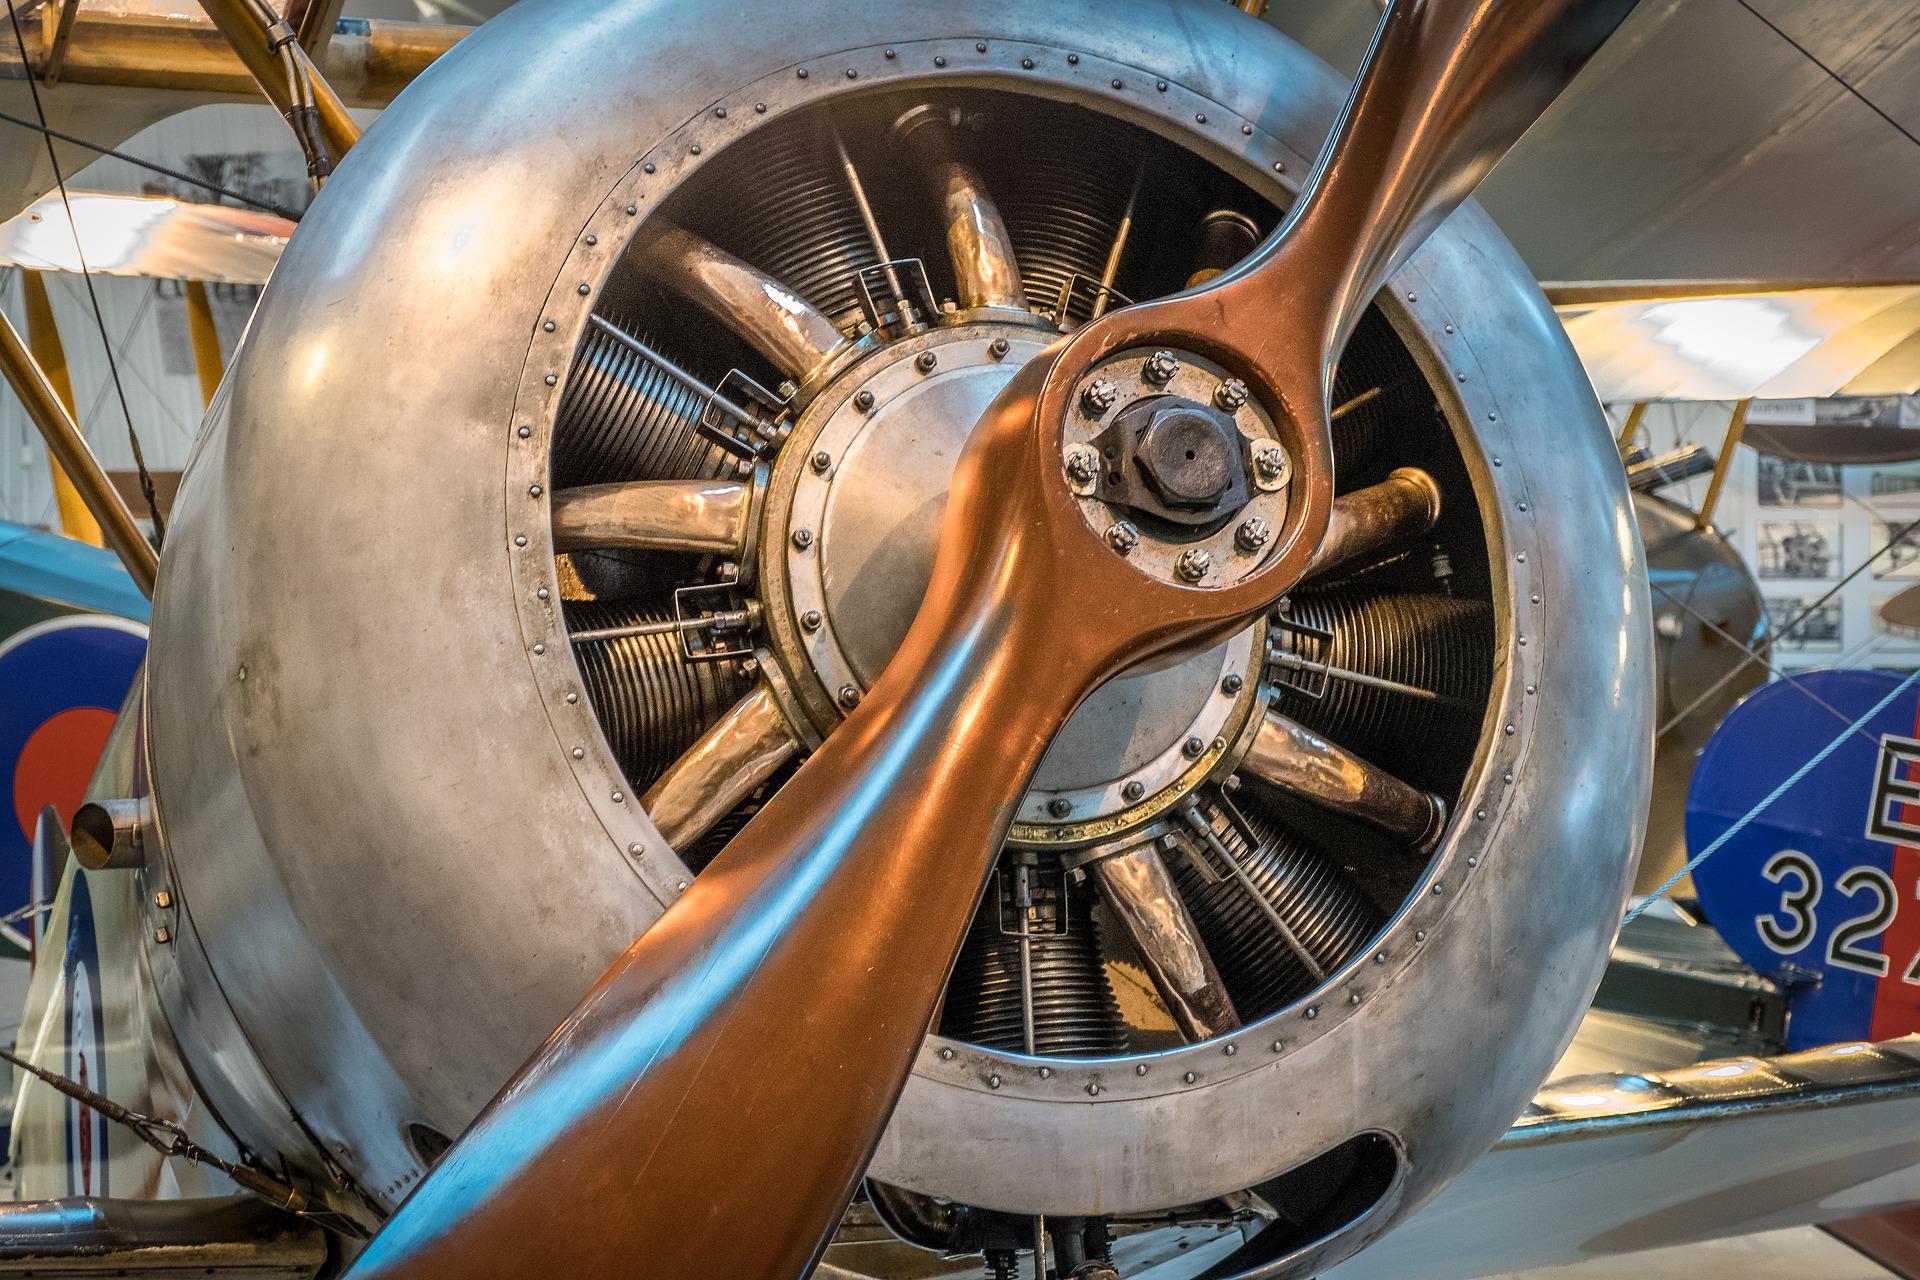 Aeroplane restoration